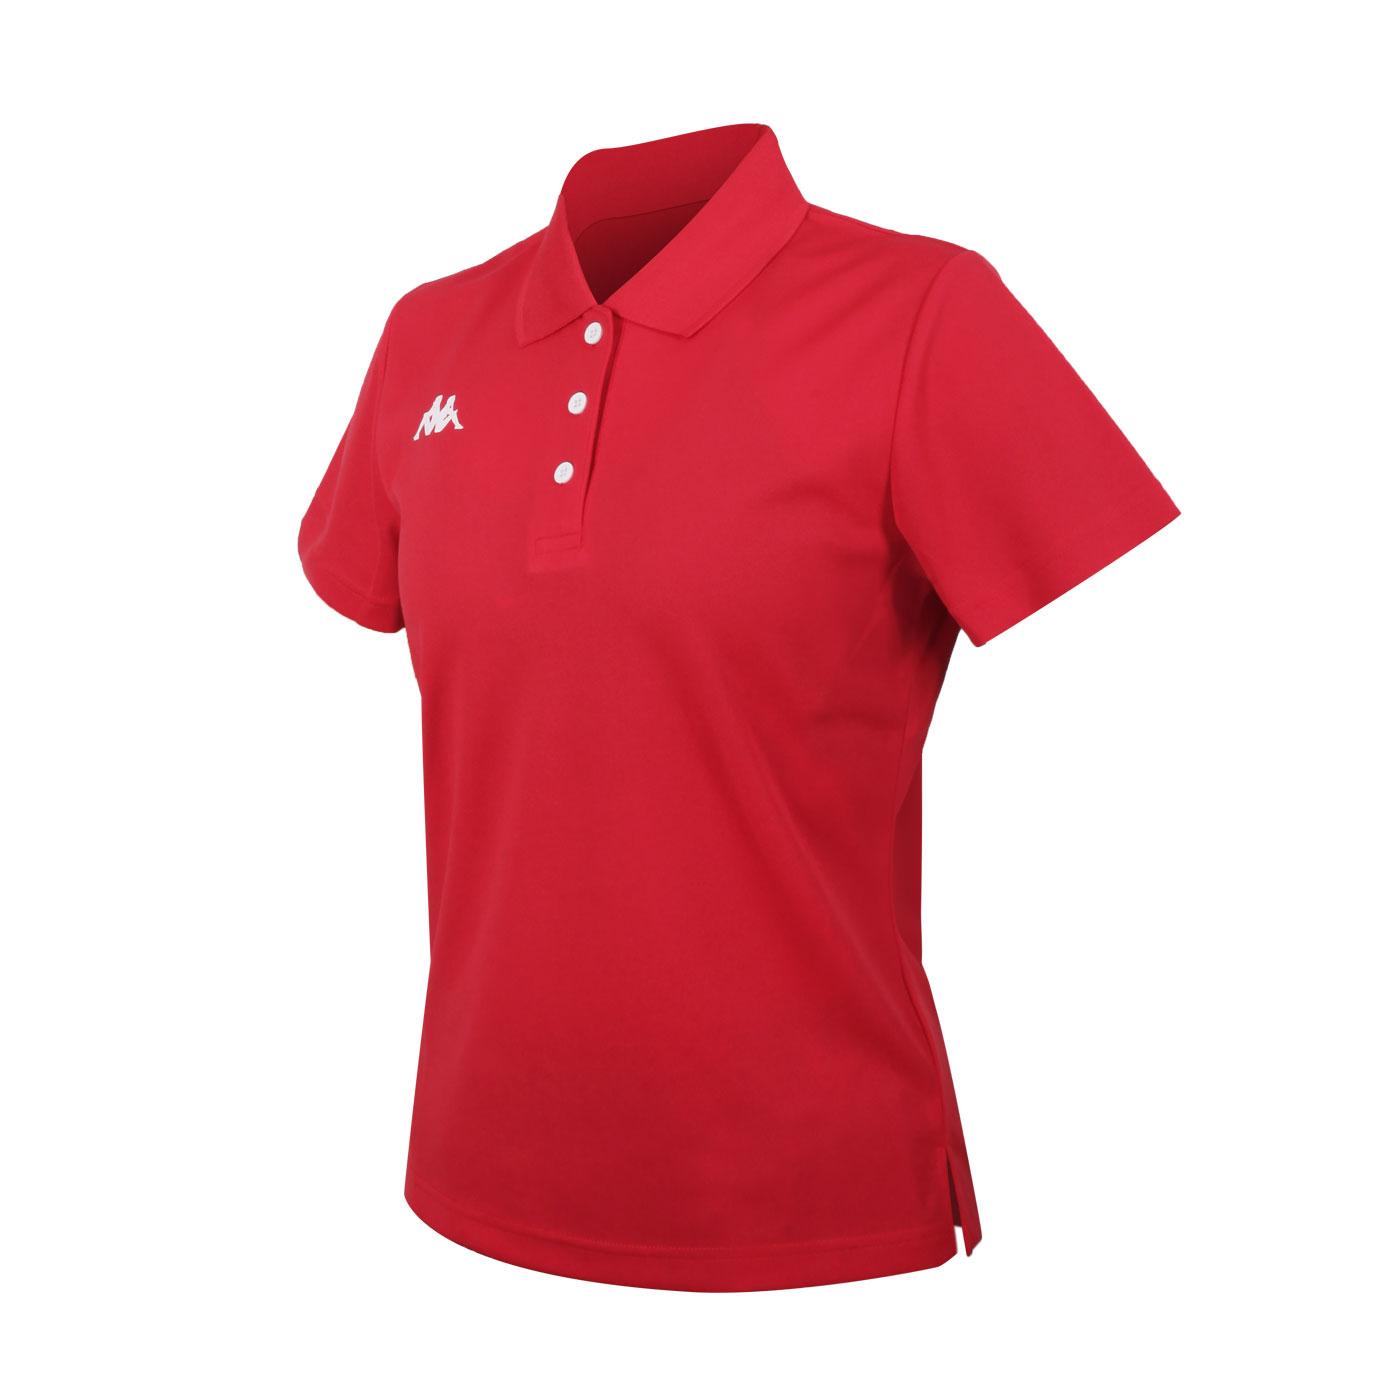 KAPPA 女款K4T短袖POLO衫 321763W-D18